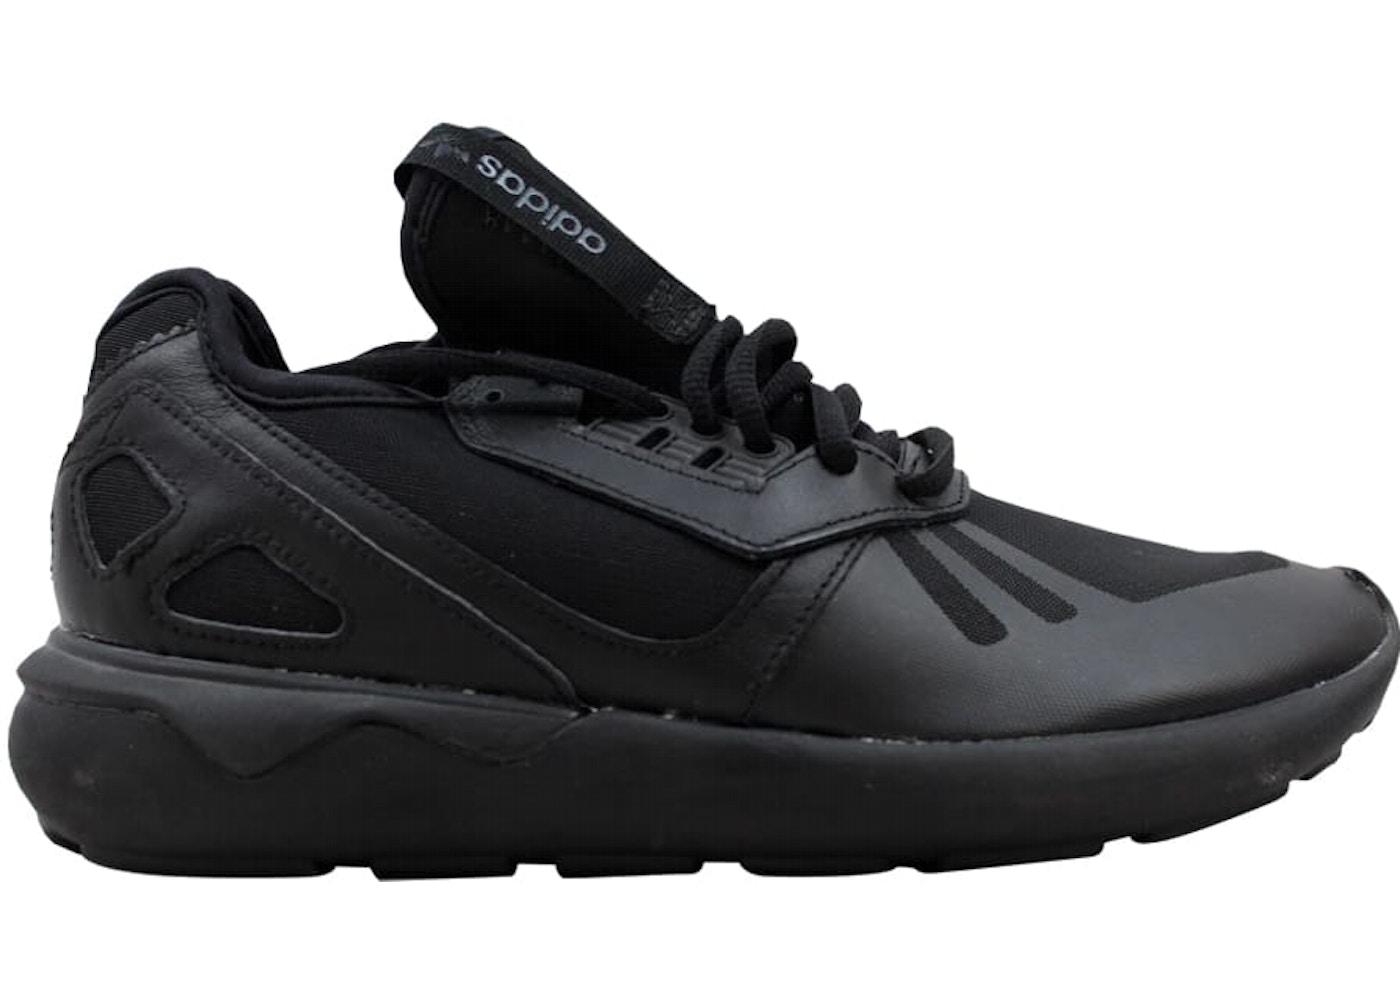 new style 42cd3 acb25 adidas Tubular Runner W Black/Black (W)